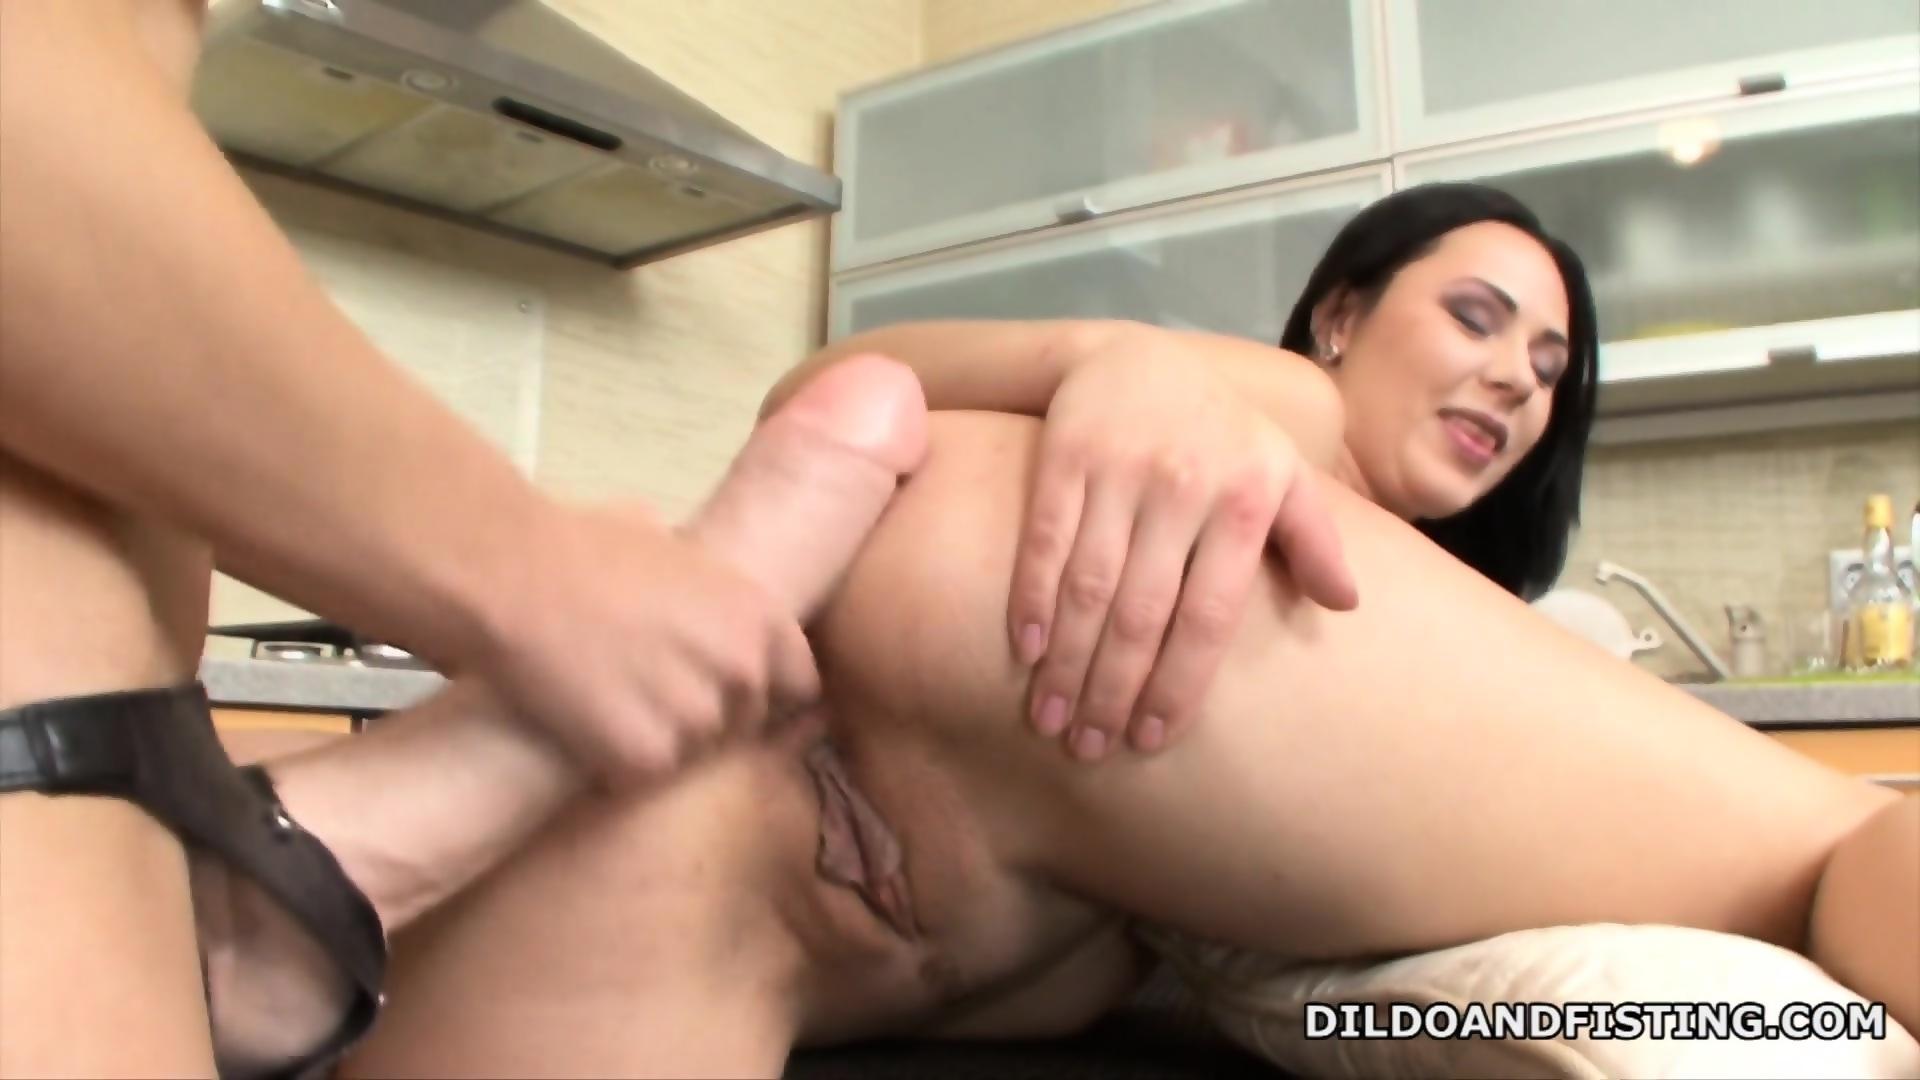 Extreme multiple orgasm